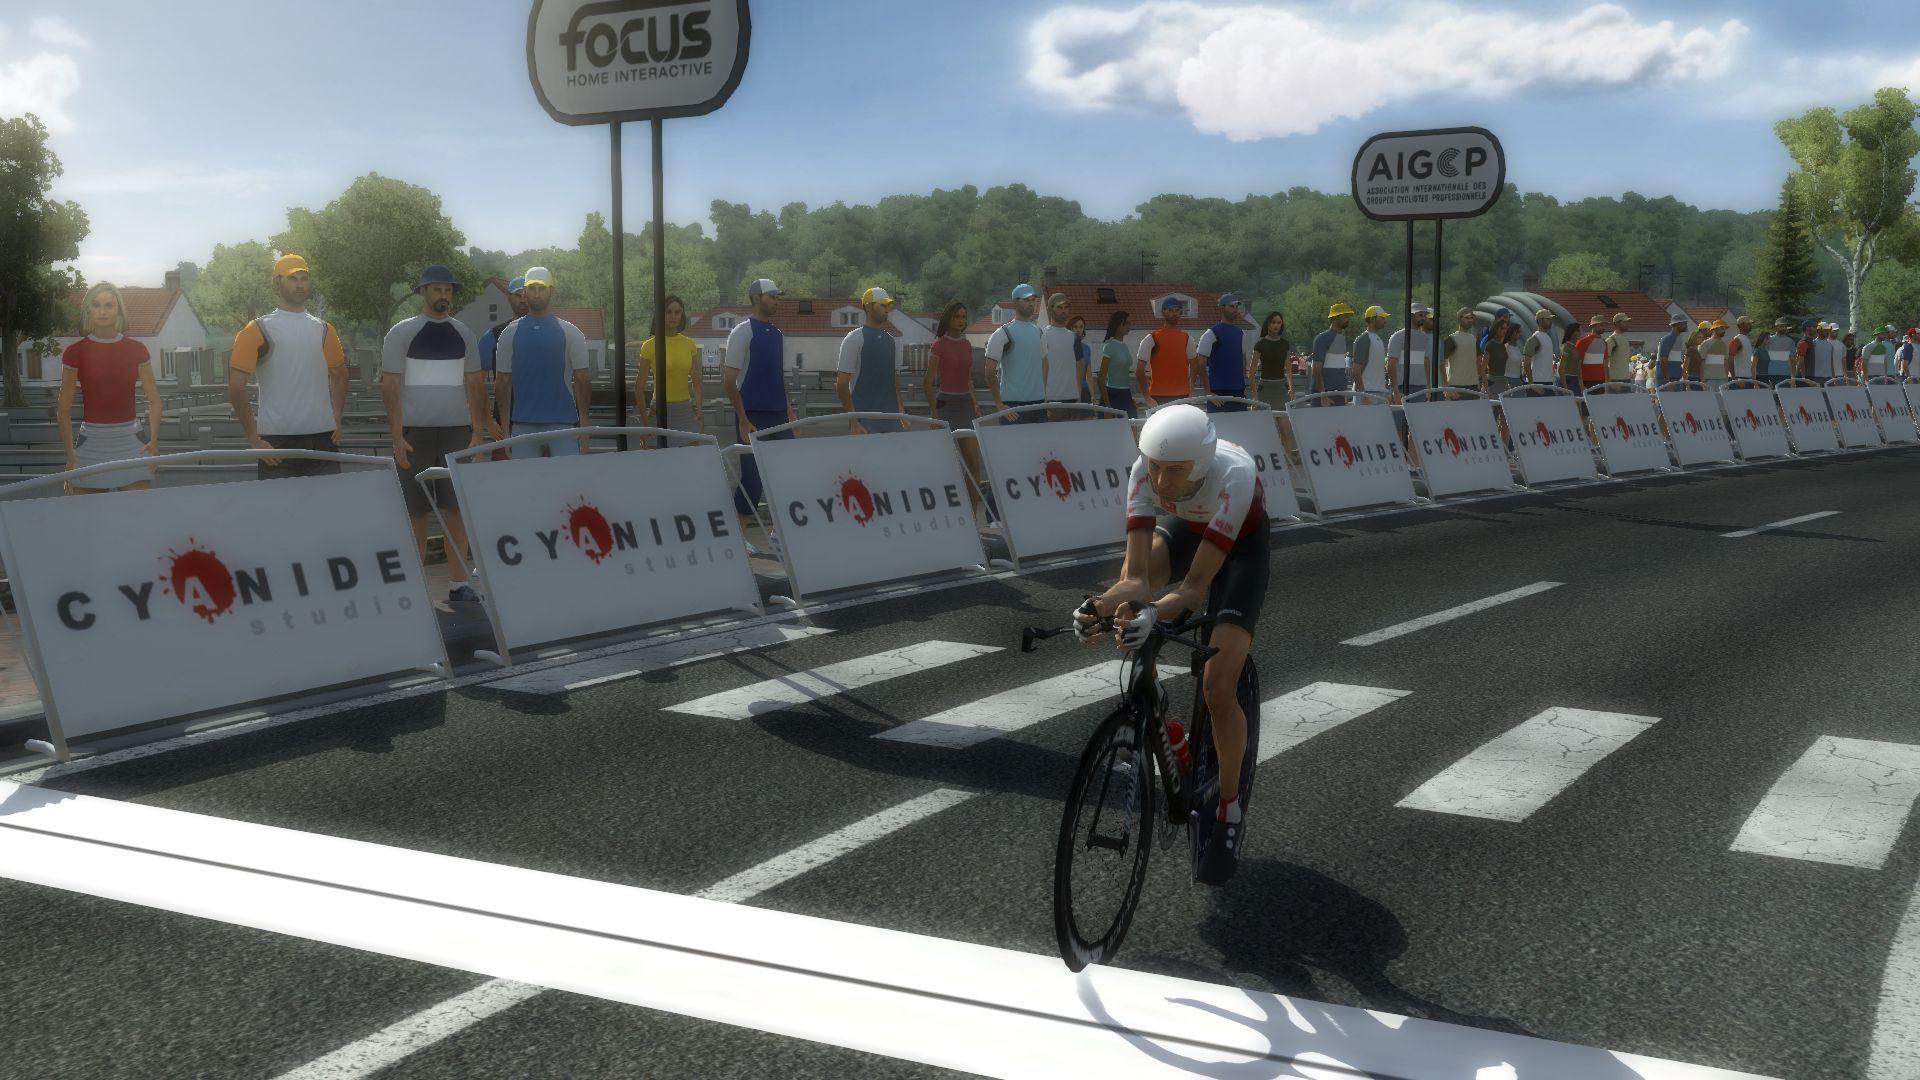 pcmdaily.com/images/mg/2019/Races/C1/Bayern/S4/mg19_bay_s04_52.jpg